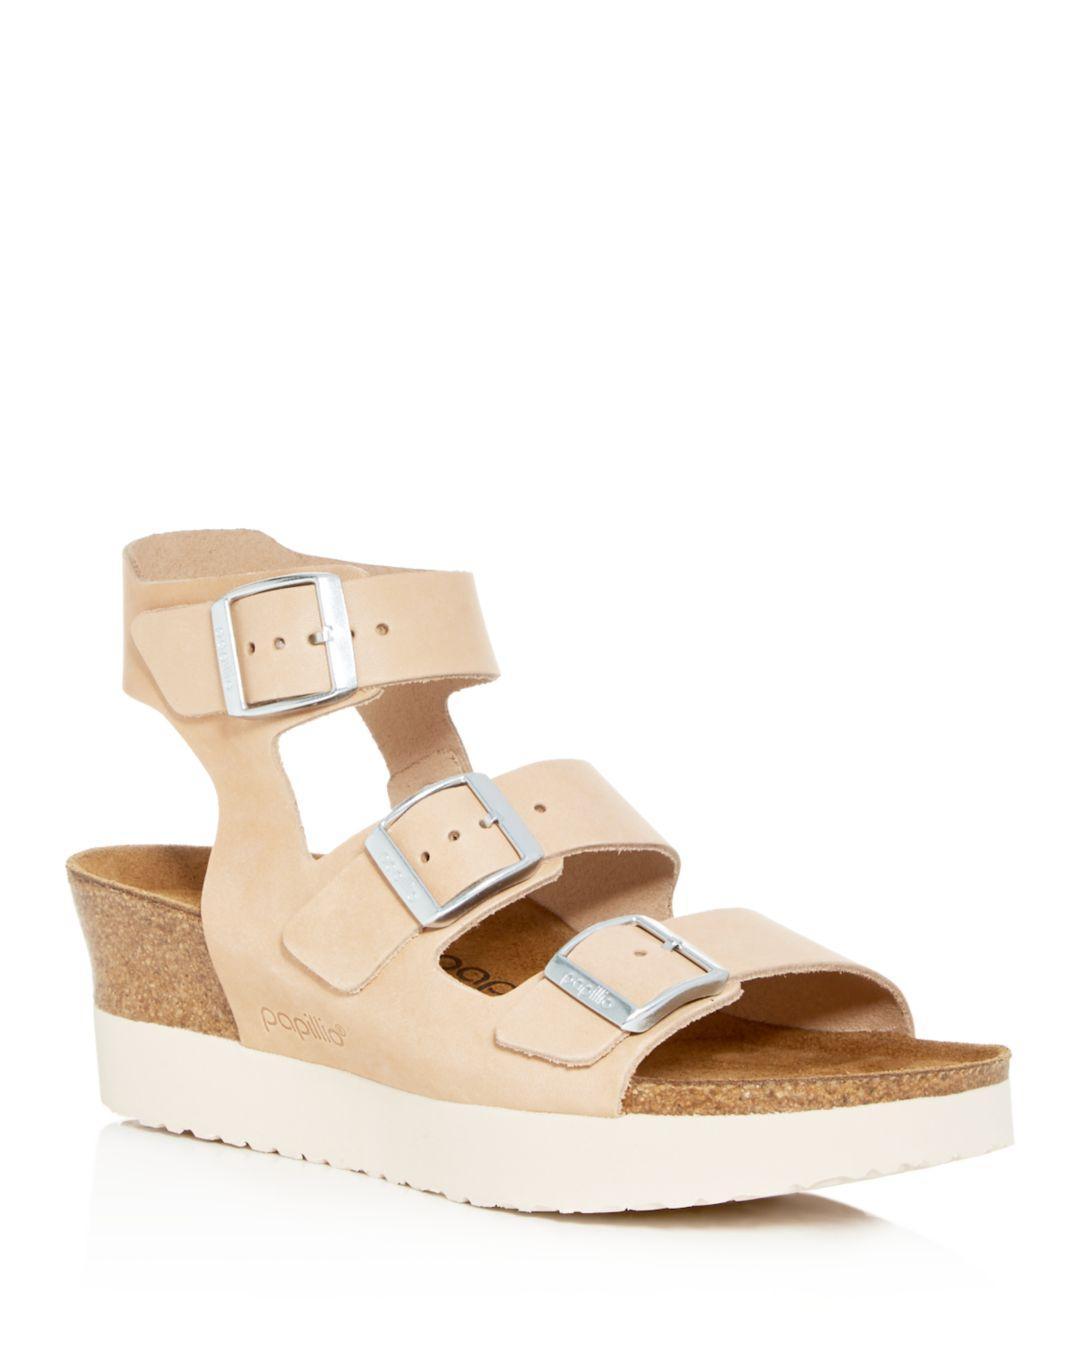 725d733eed05 Lyst - Birkenstock Women s Papillio By Linnea Platform Wedge Sandals ...